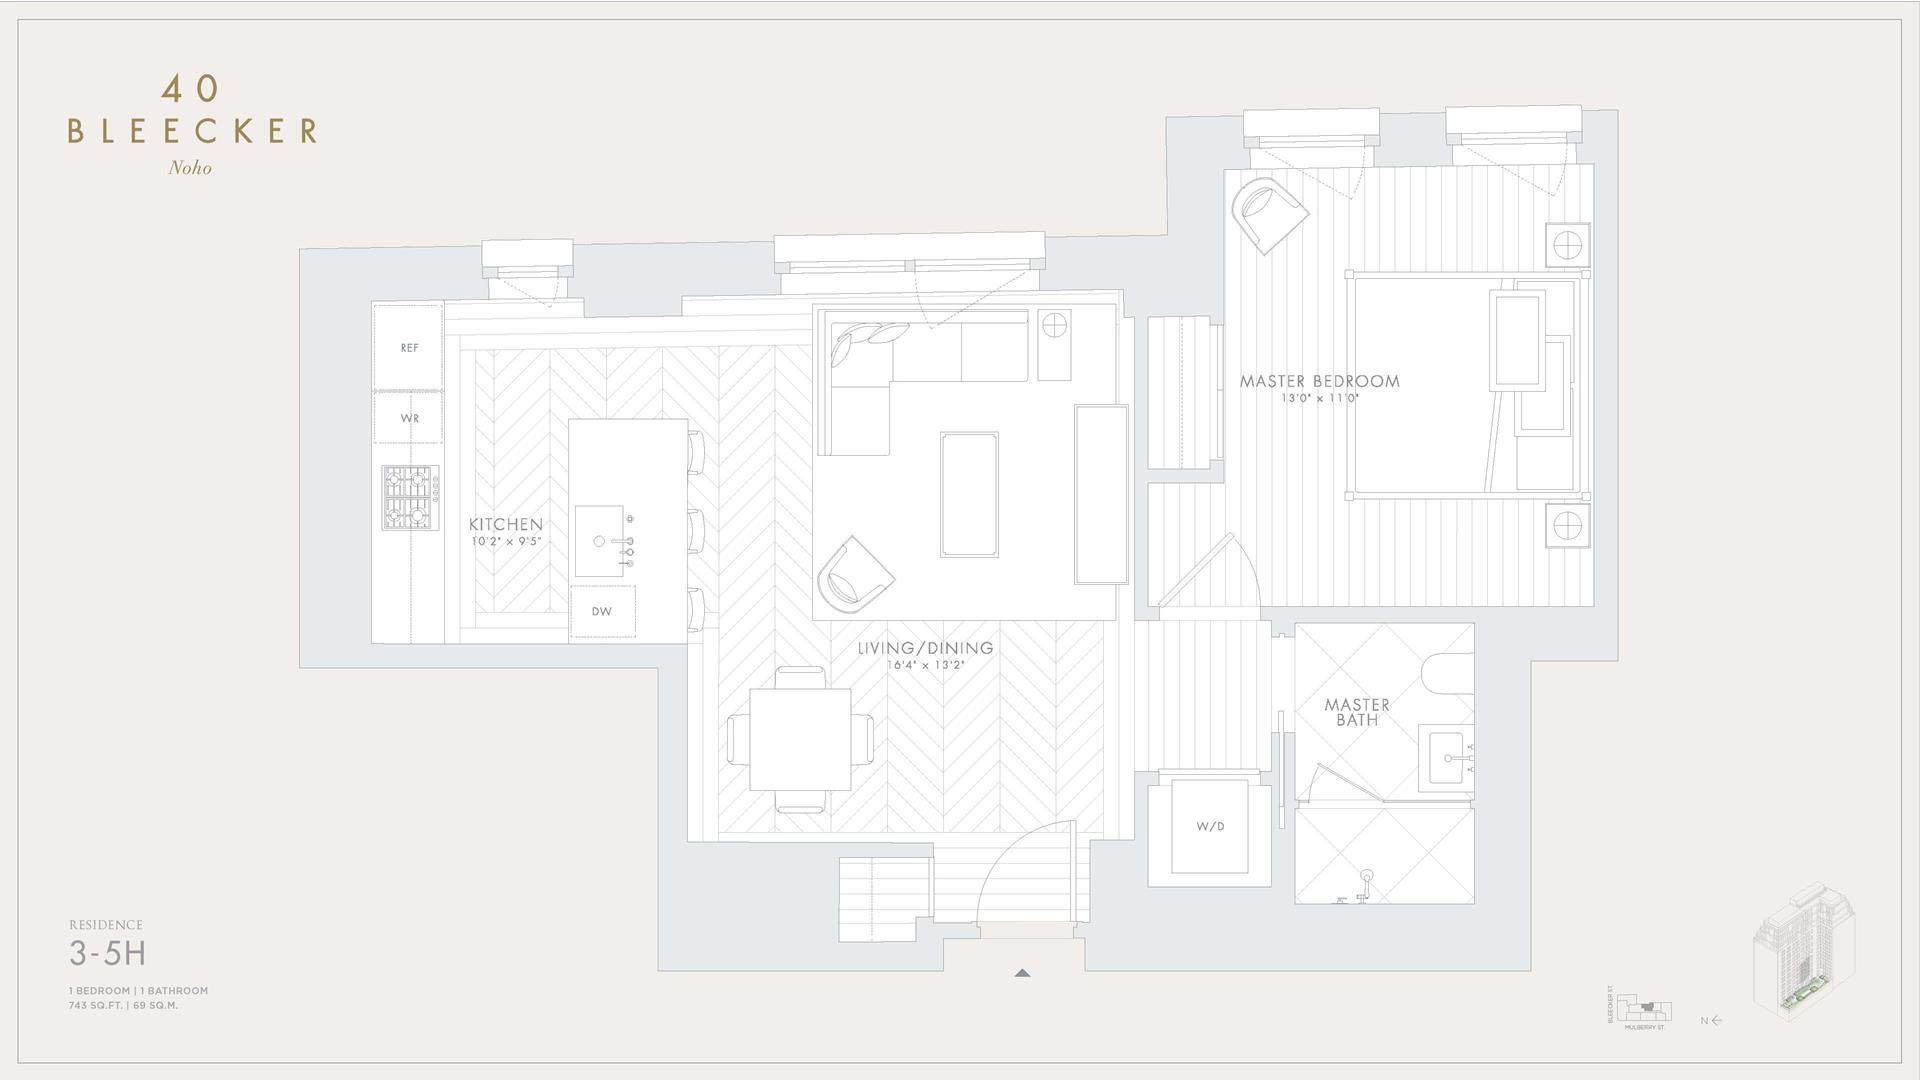 Floor plan of 40 Bleecker Street, 4H - NoHo, New York